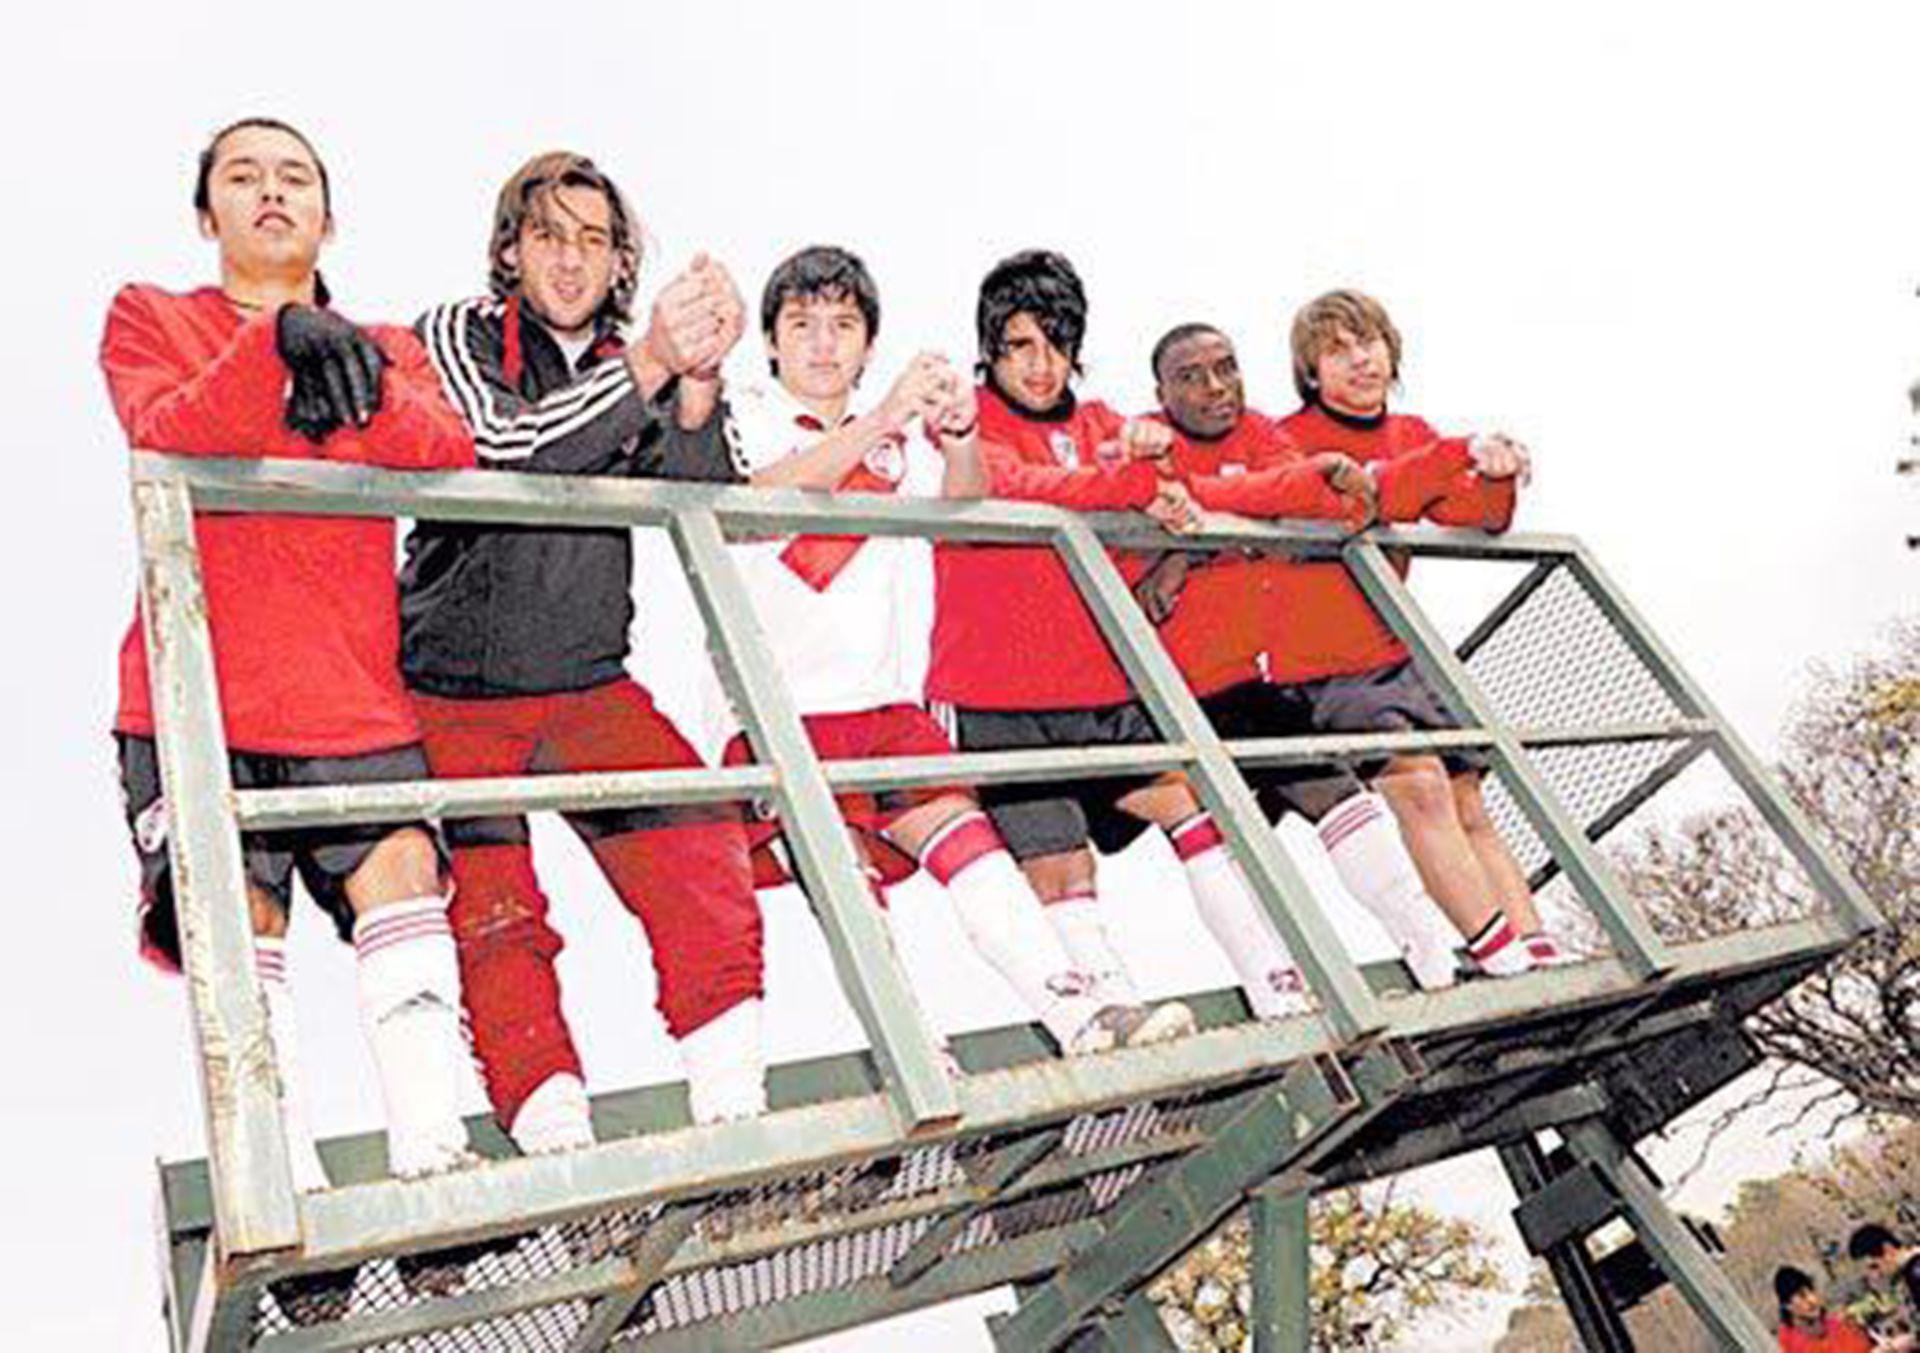 Judelin Aveska integró la cuarta y la reserva de River Plate (judelin.aveska2)